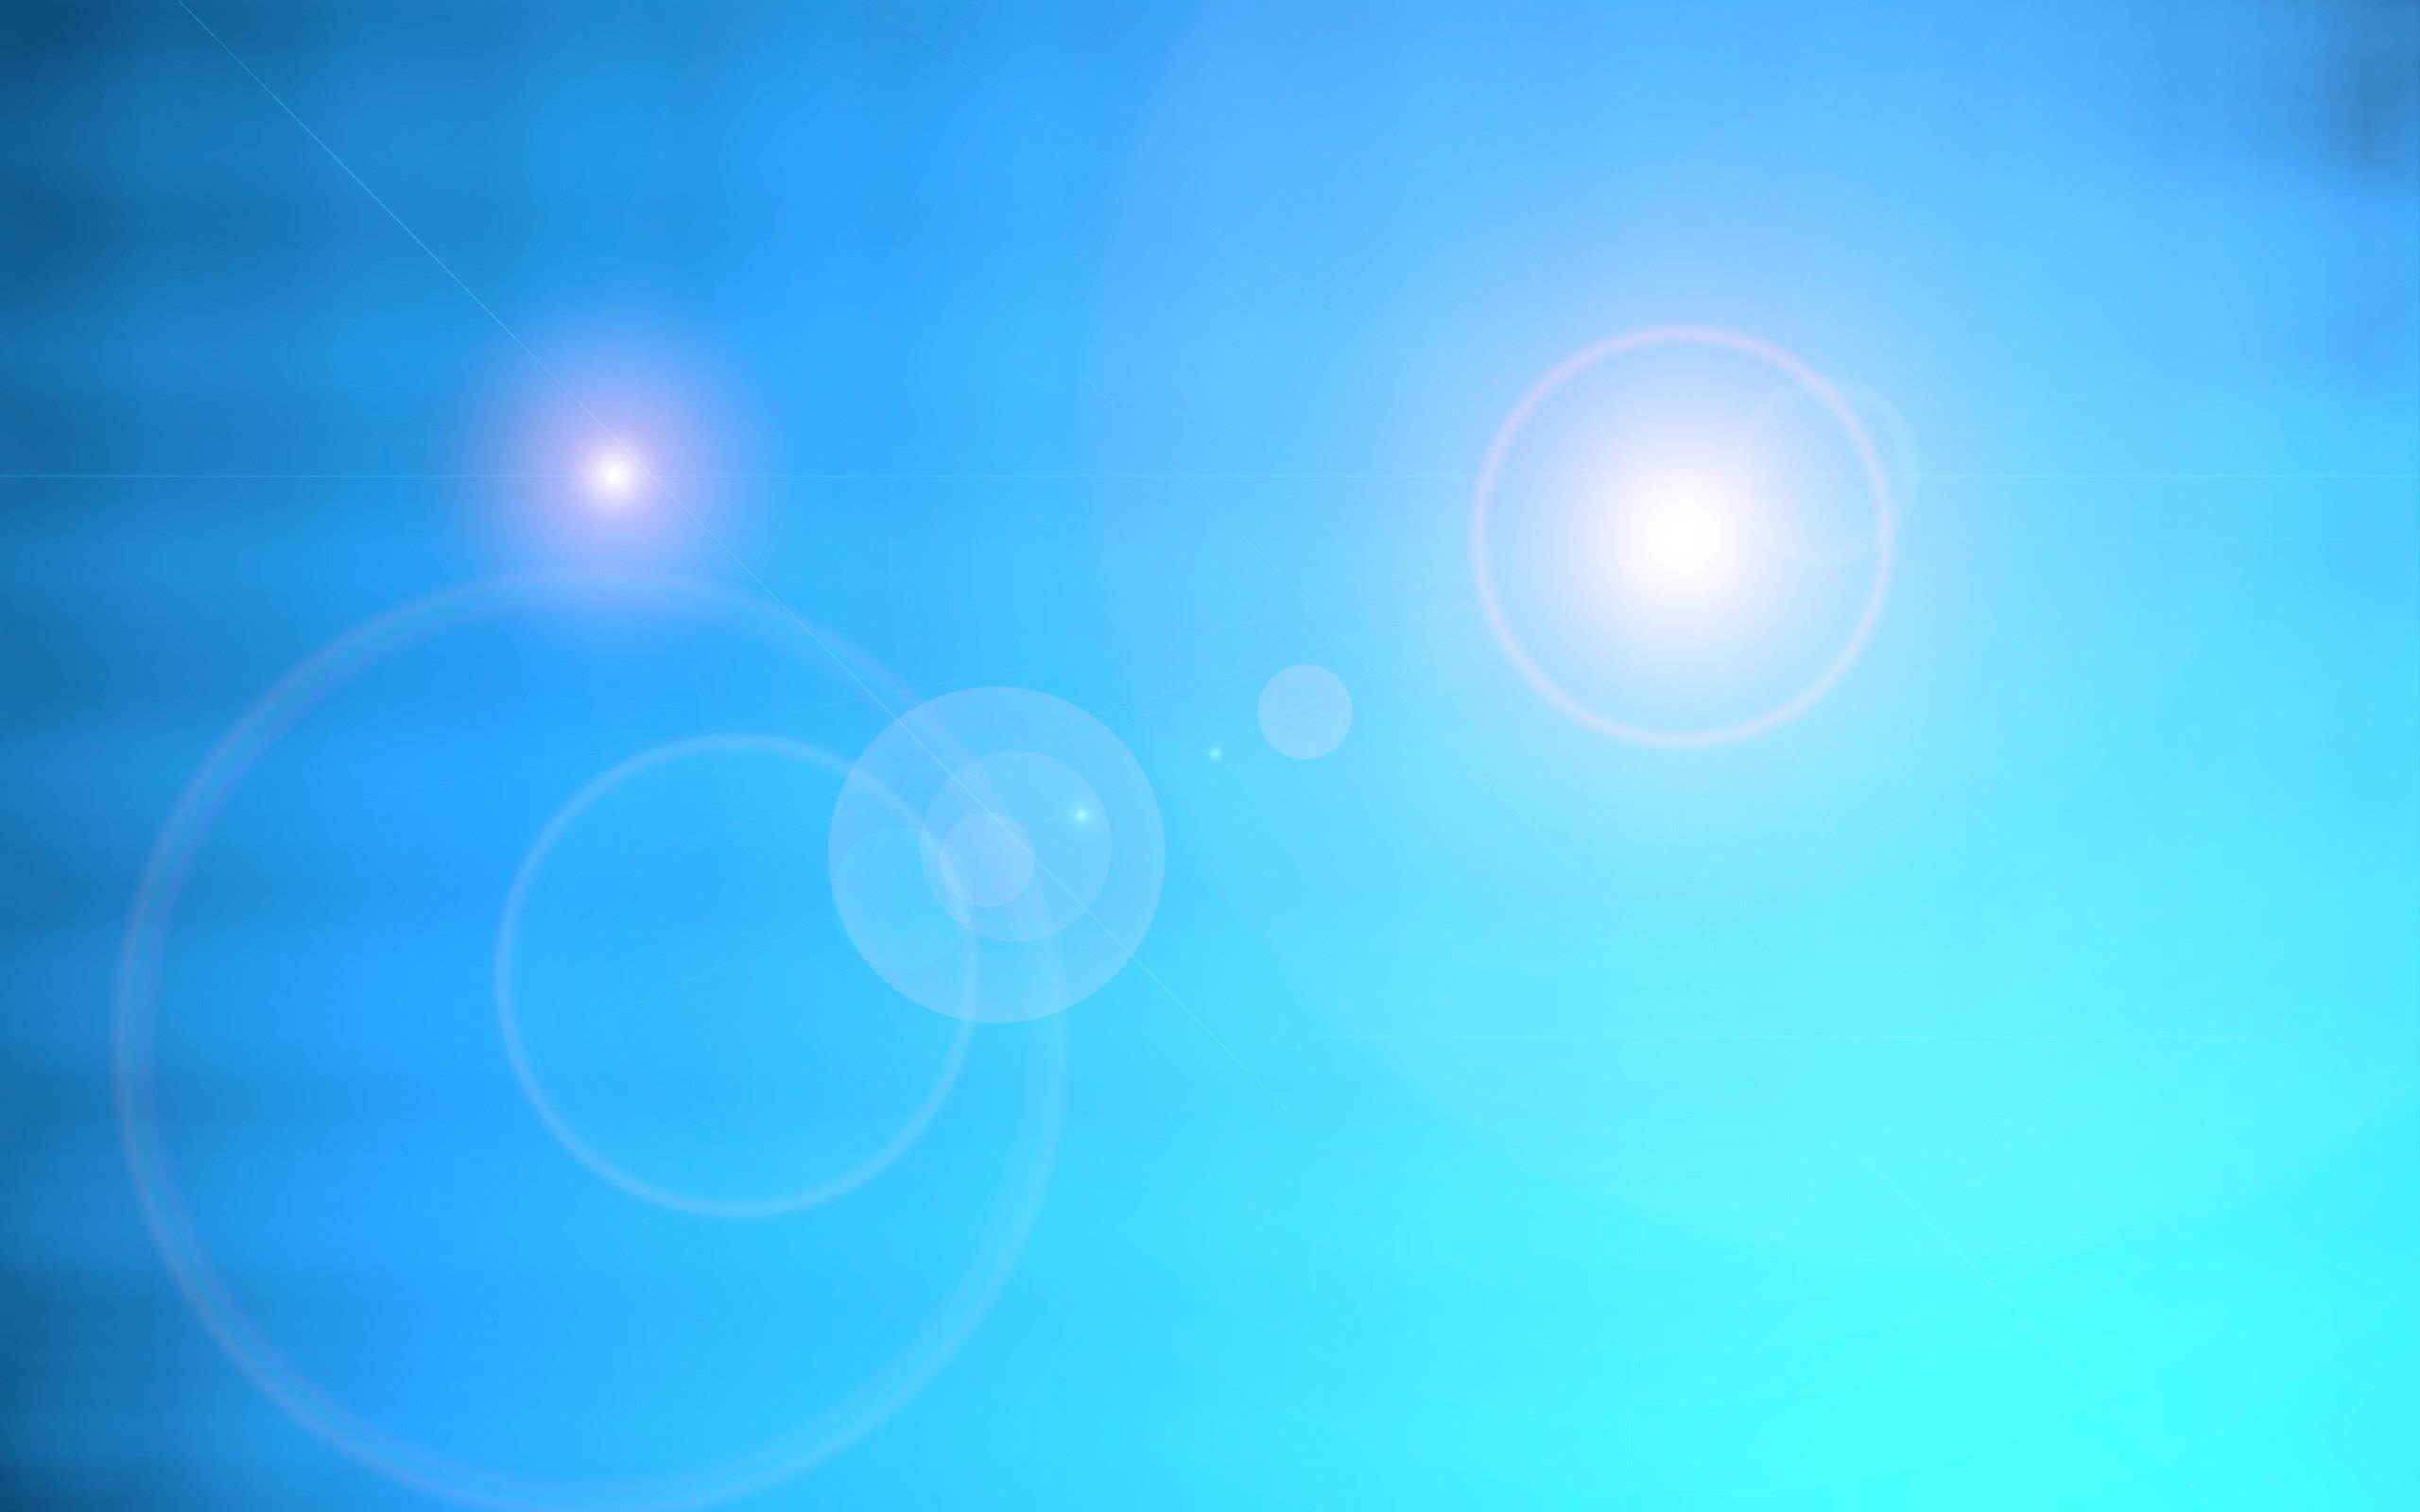 blue desktop background for Mac OS and Windows Vista. (High .